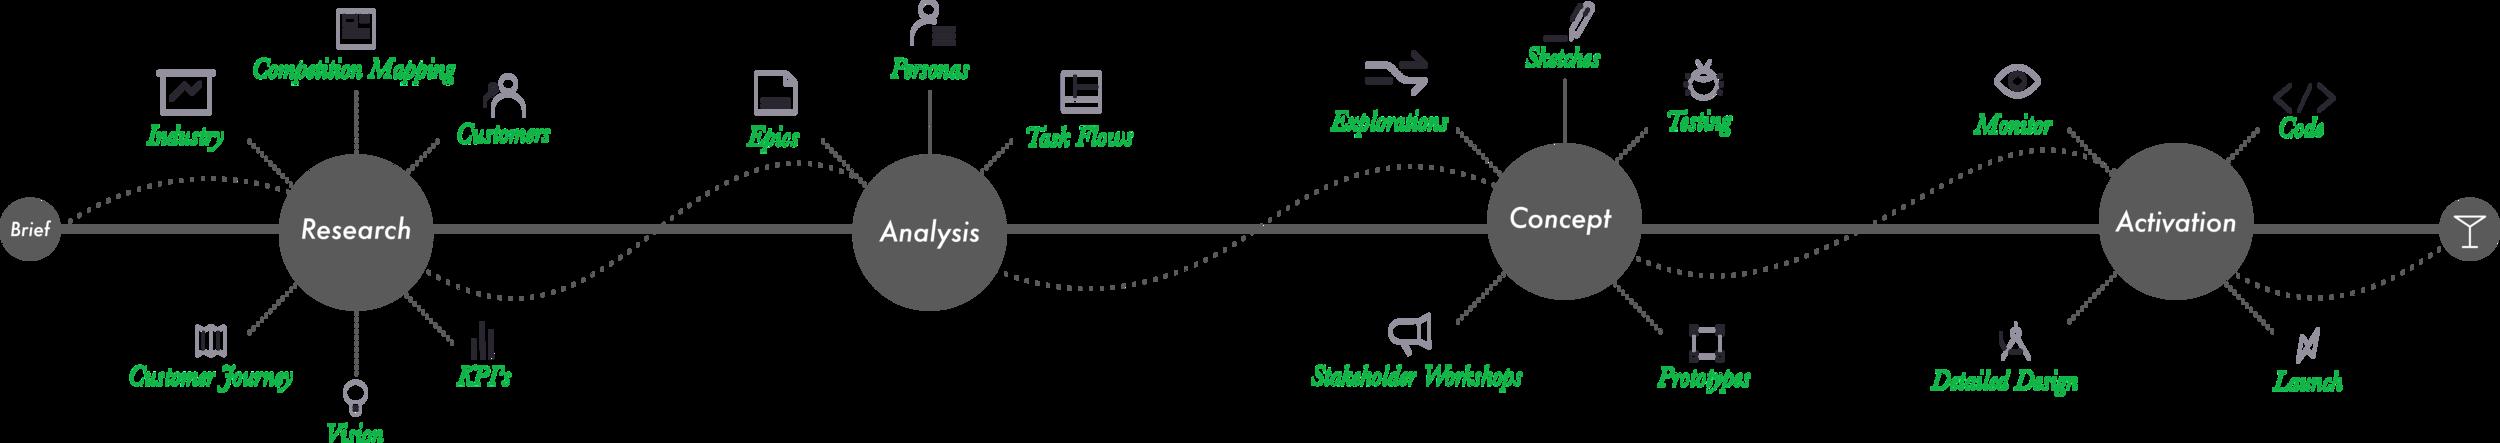 The UX DesignProcess